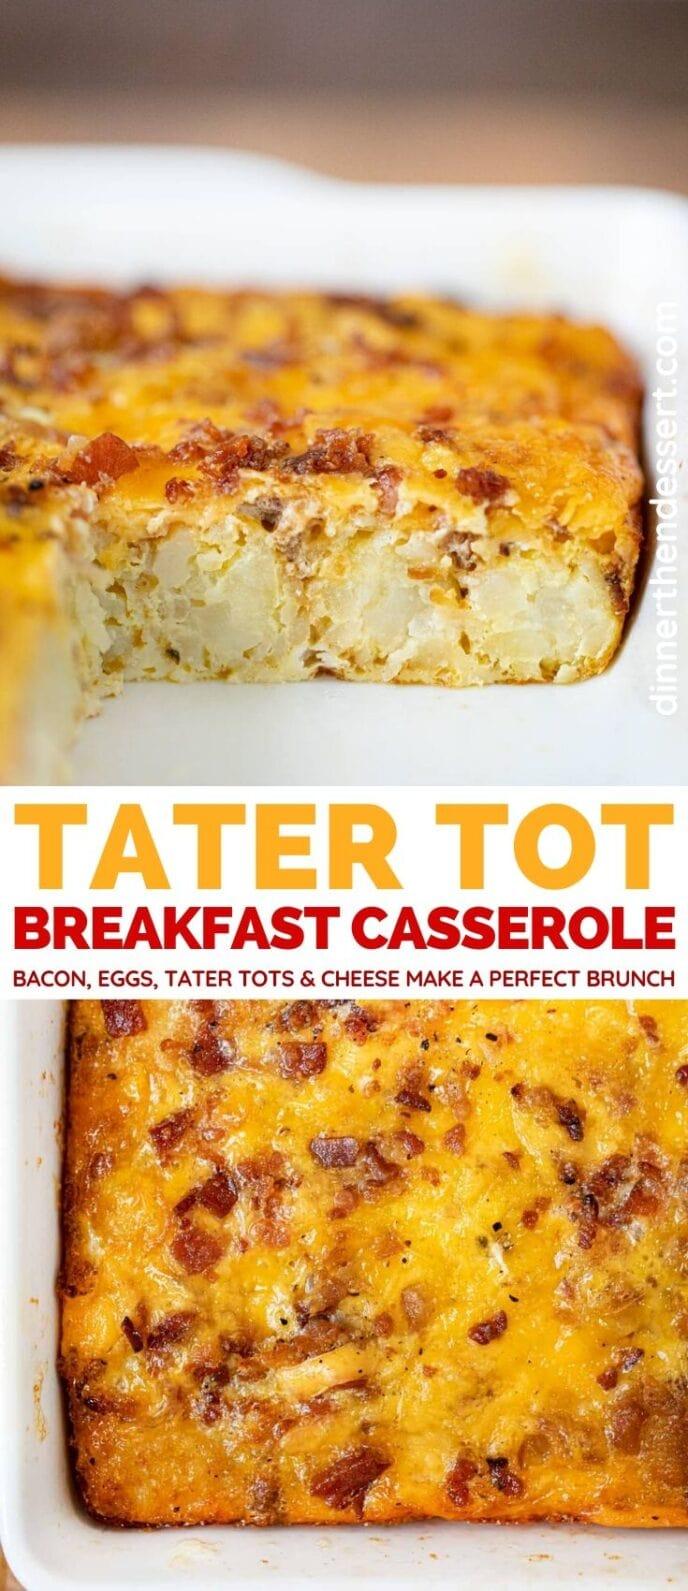 Tater Tot Breakfast Casserole collage